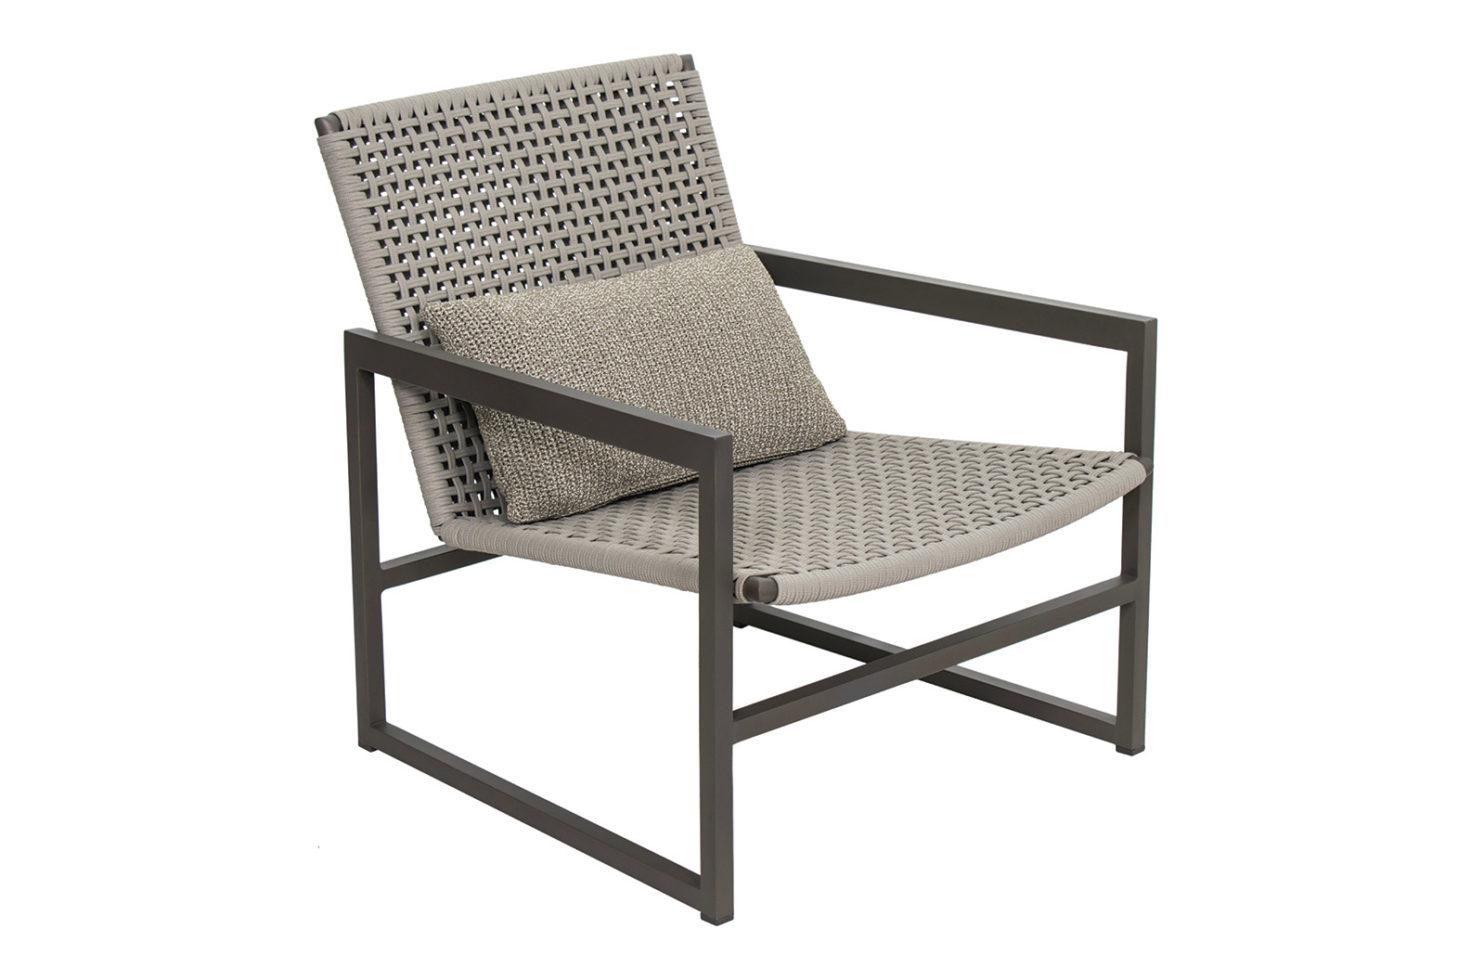 Archipelago Torres Lounge Cushion 620FT028P2JNB 1 3Q